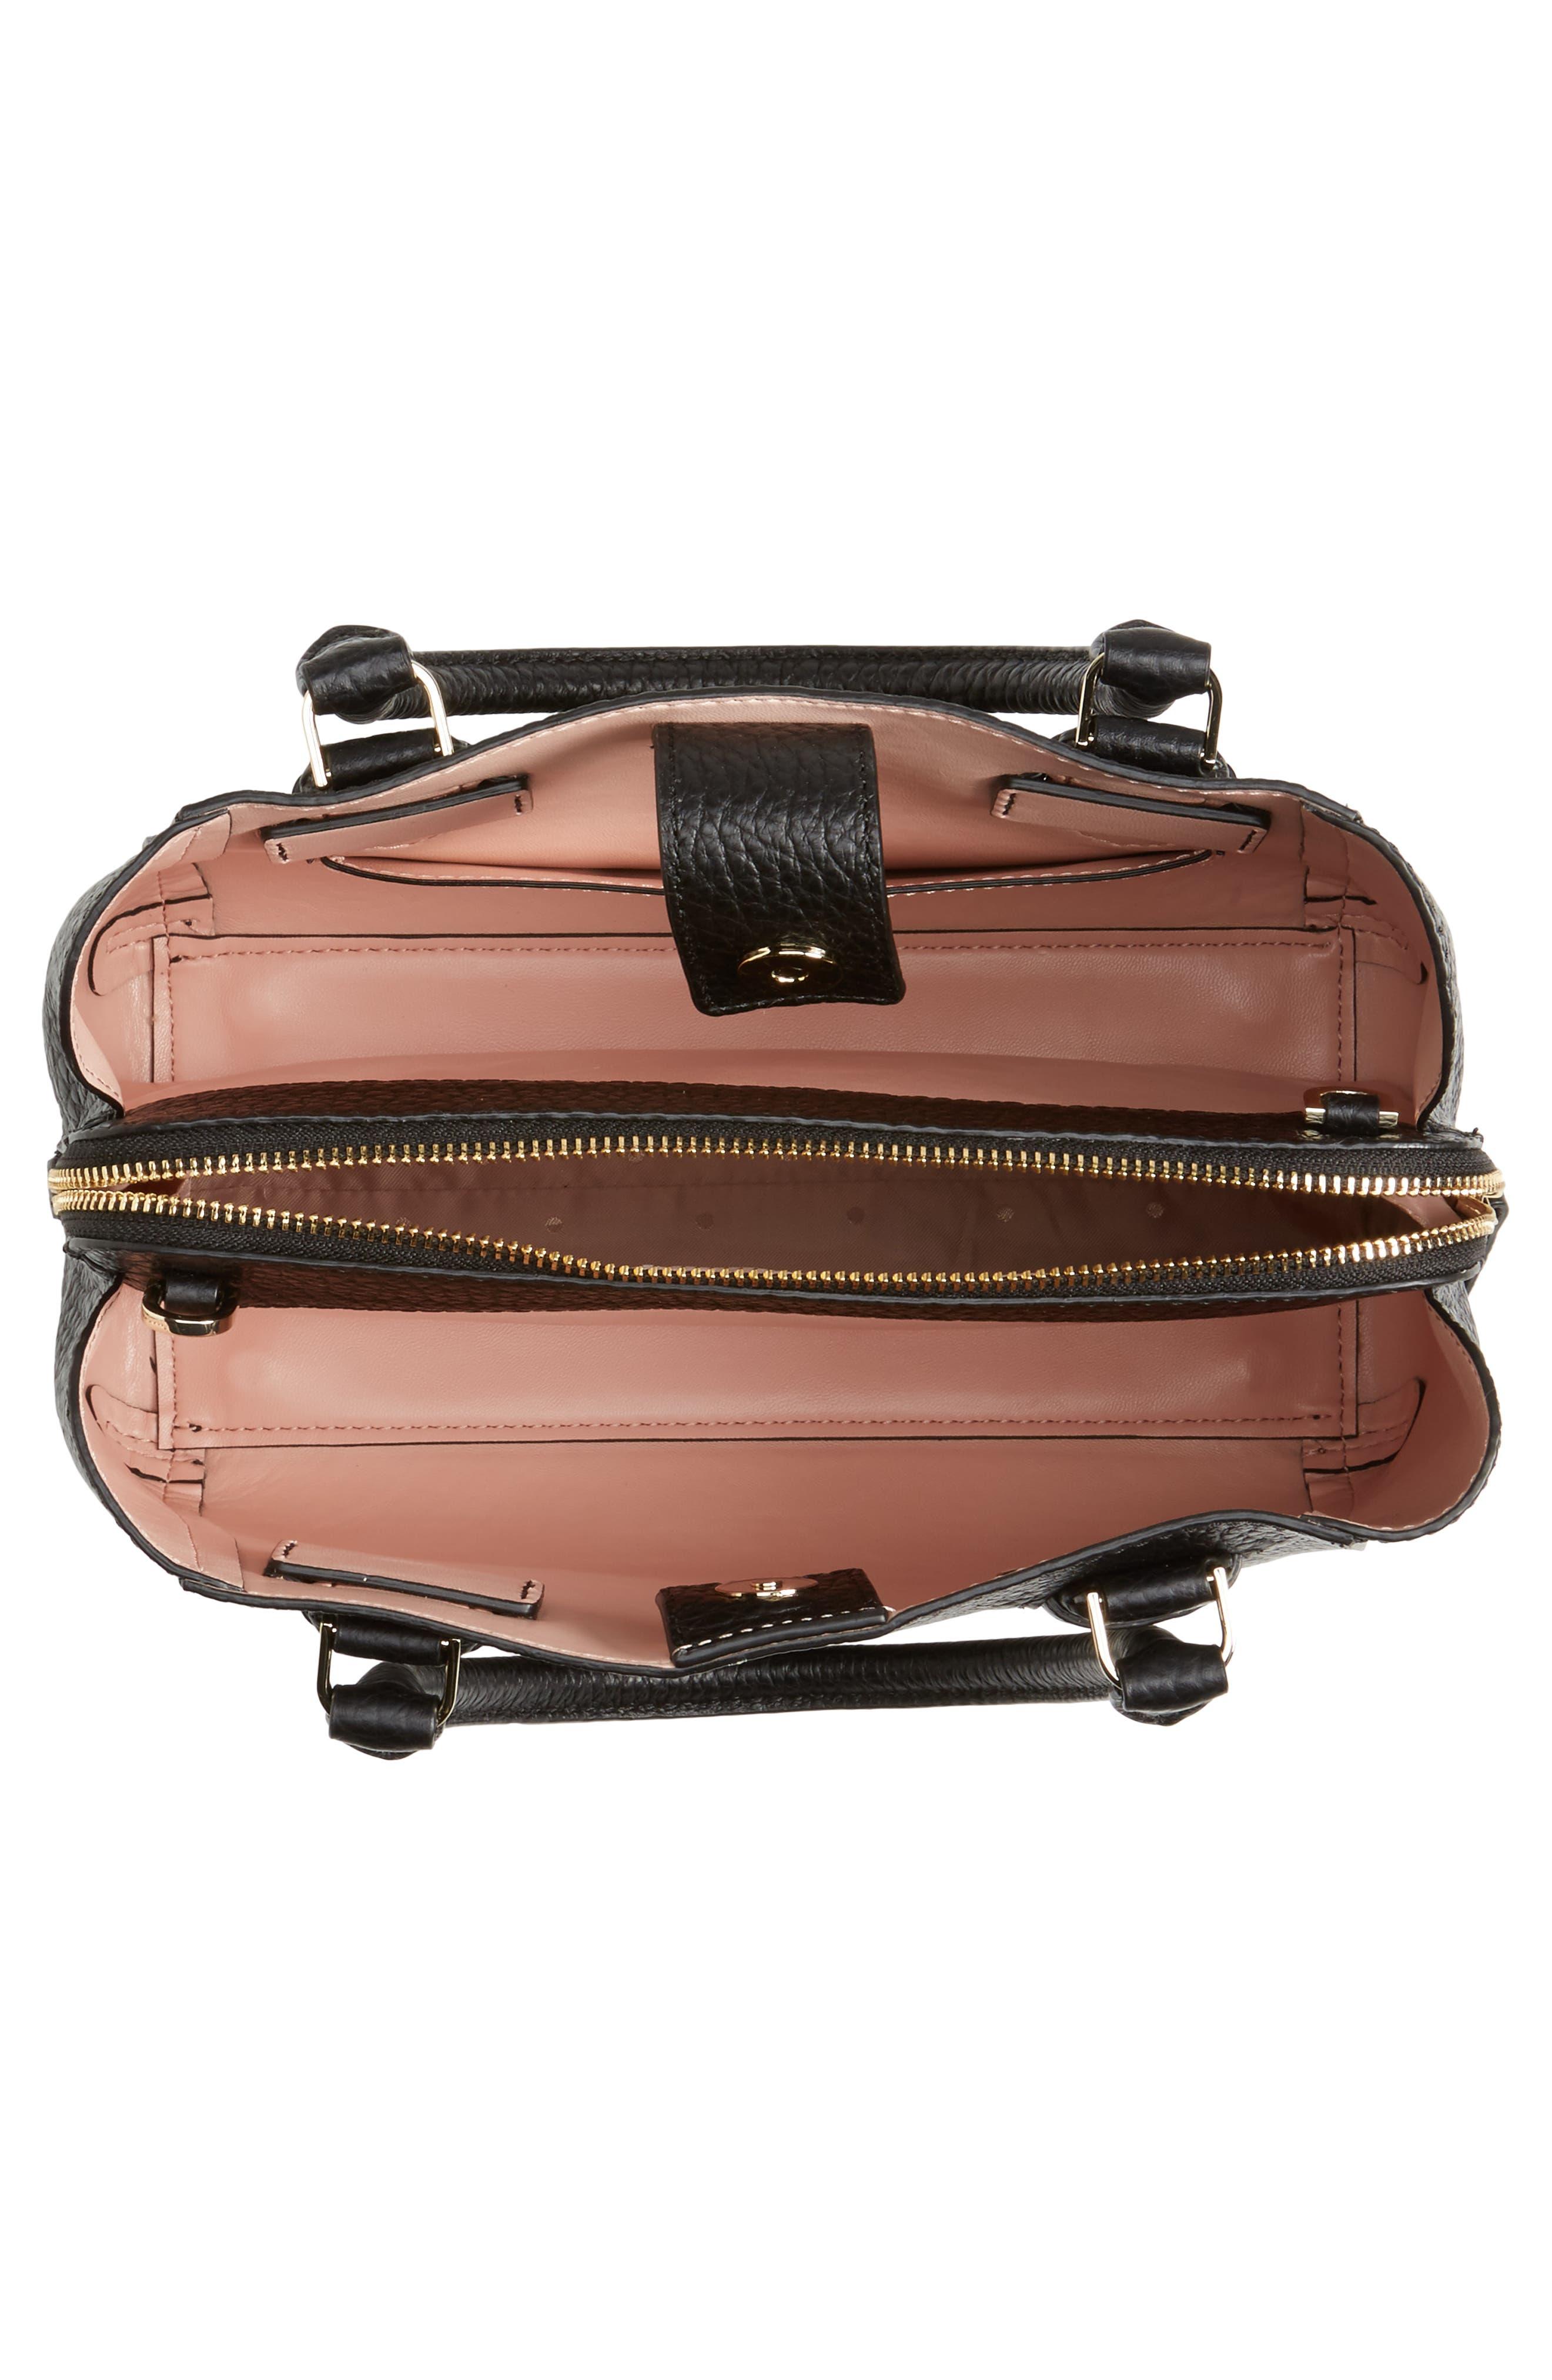 carter street - aliana leather satchel,                             Alternate thumbnail 4, color,                             001